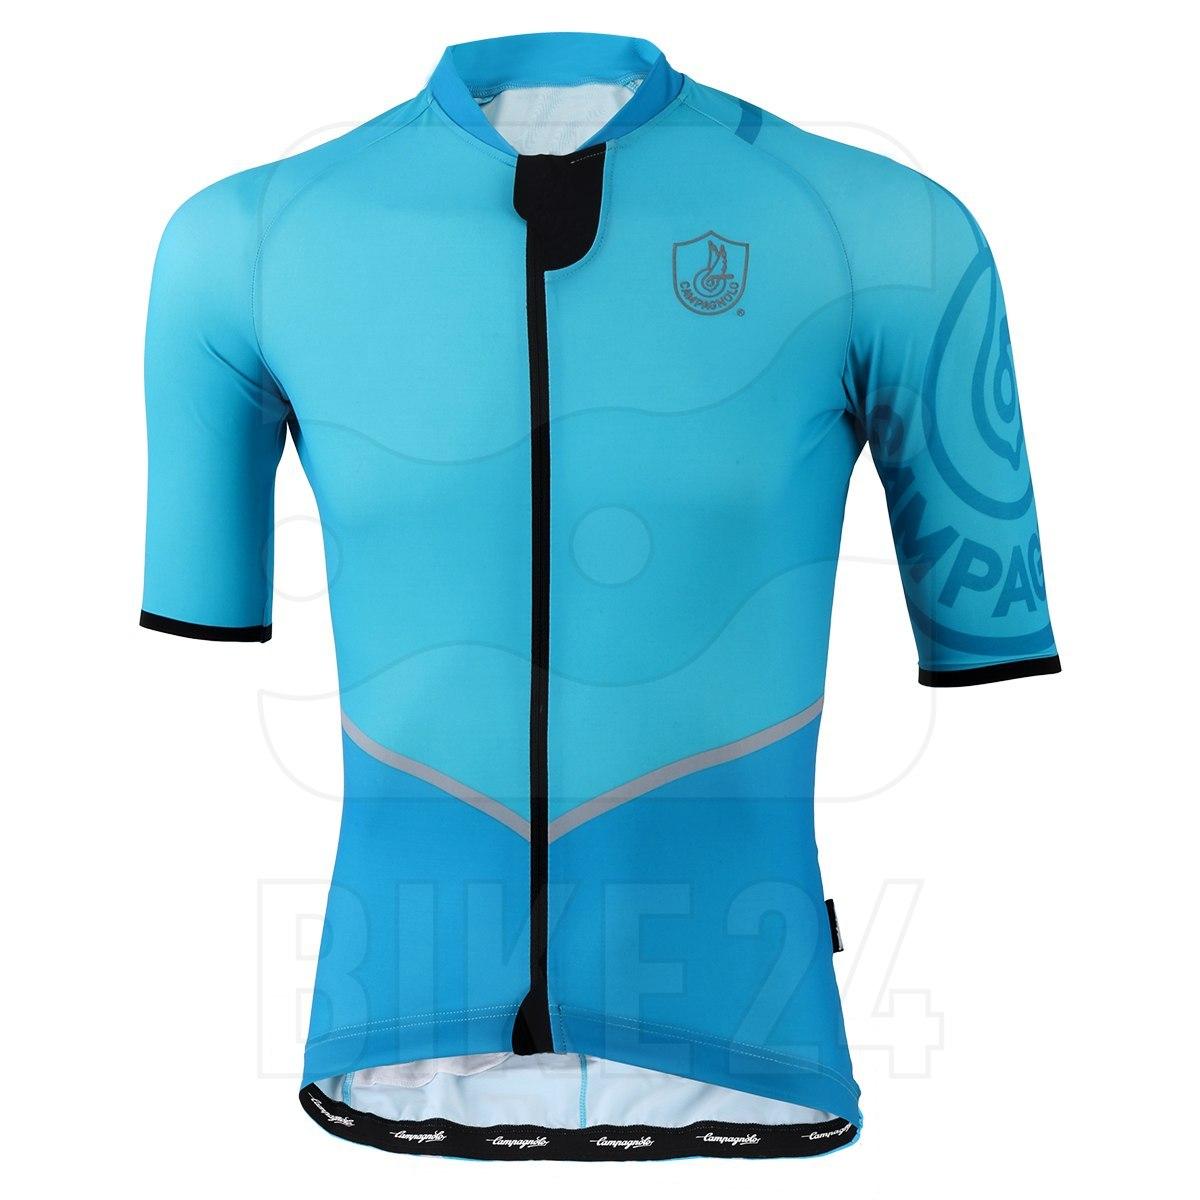 Campagnolo Titanio Jersey - Aquamarine Blue/Turquoise